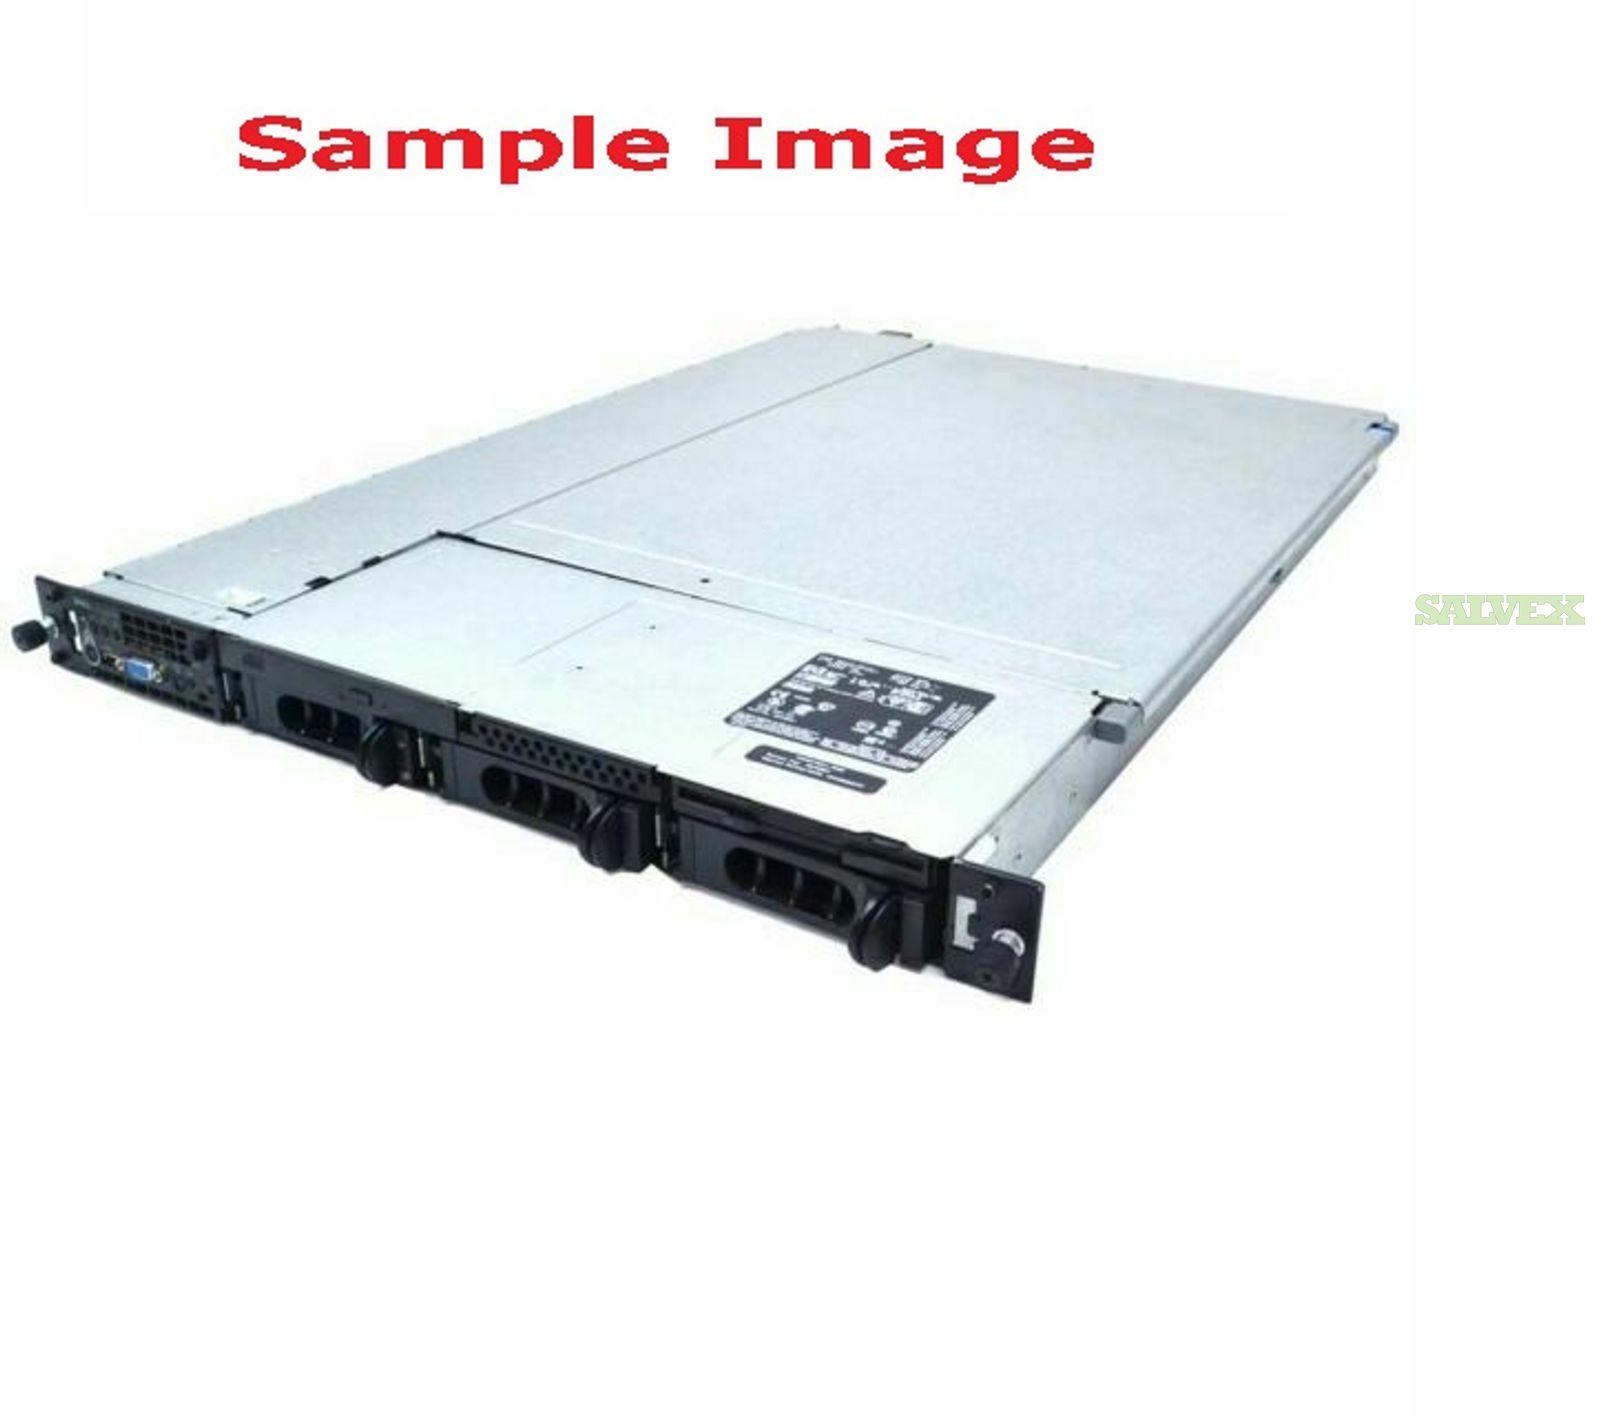 IT Equipment : Servers, IP Phones, Ups and Rack (80 Units) in Miami, FL